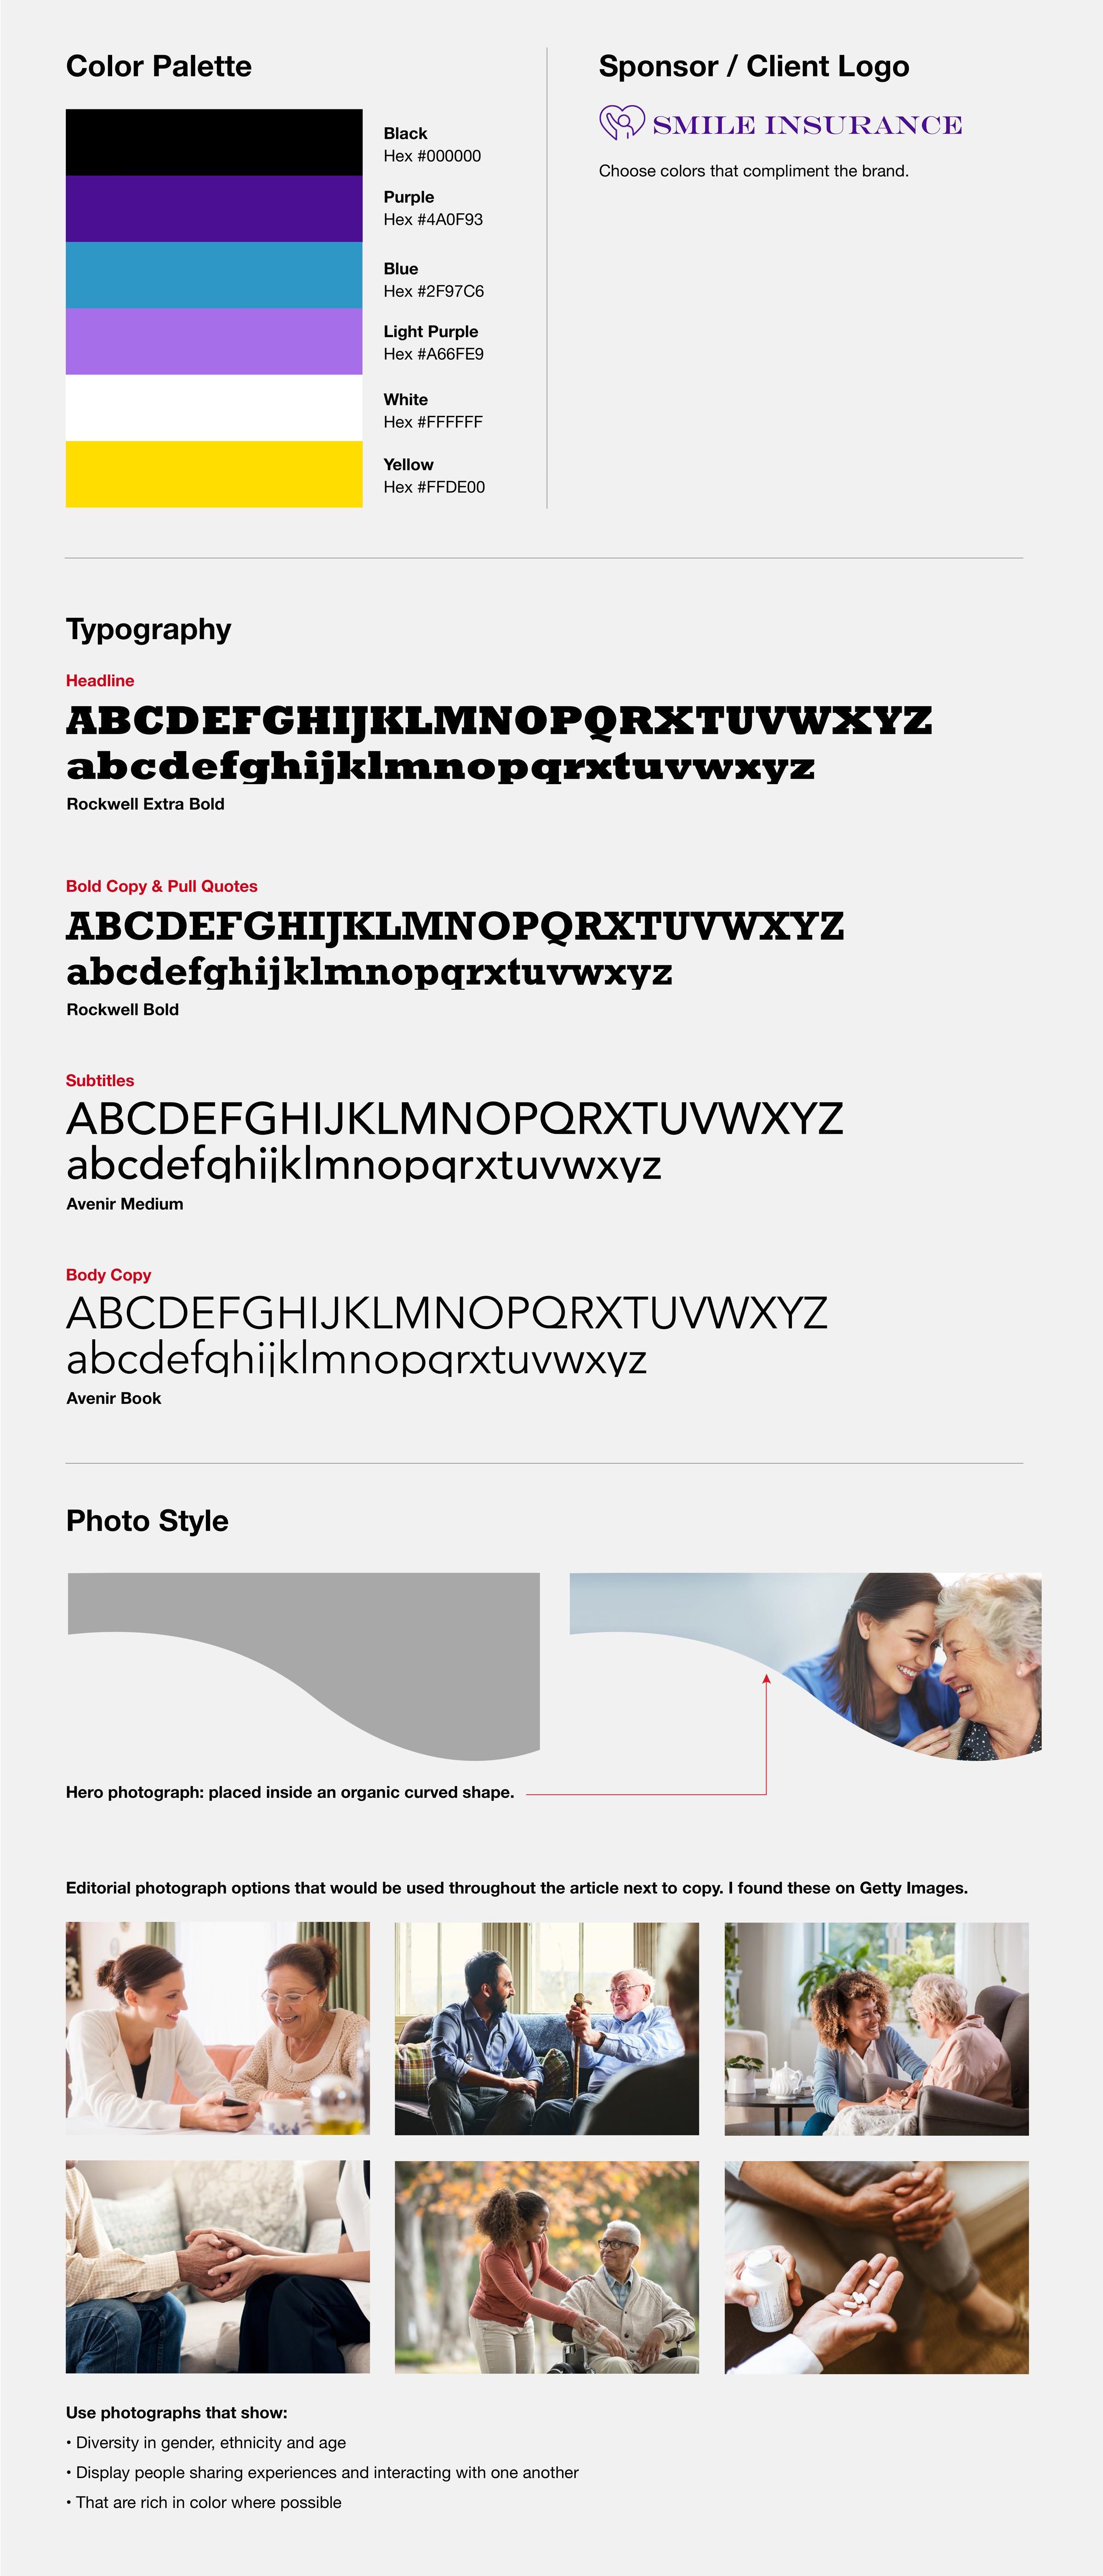 qc-desktop-styles-v1.jpg